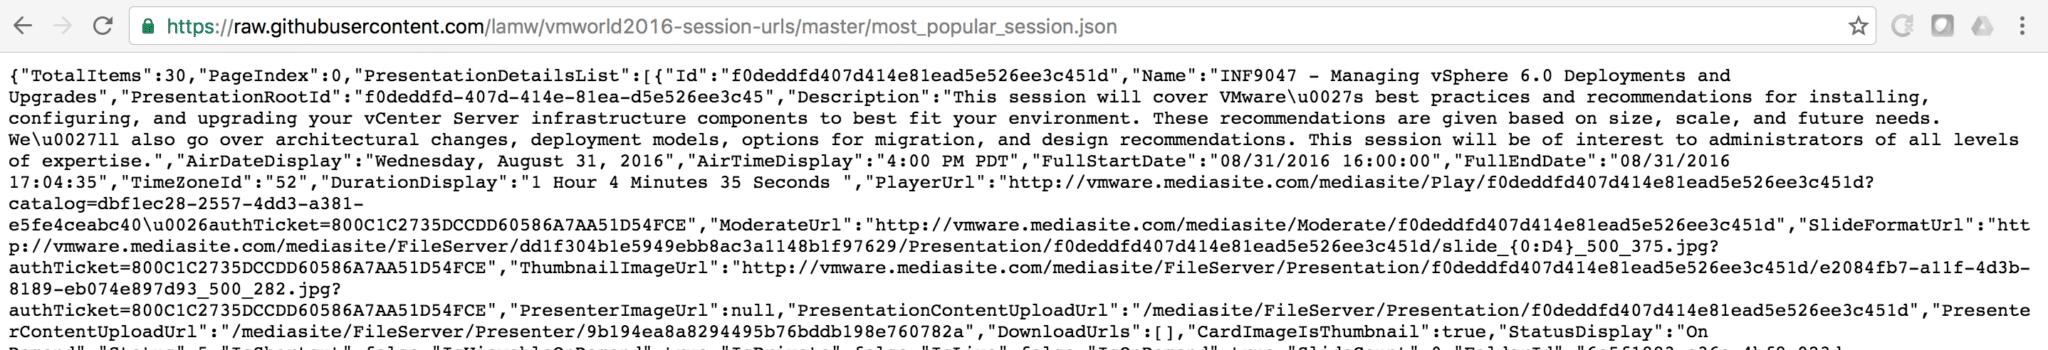 Using jq to pretty print JSON output | DiscoPosse com